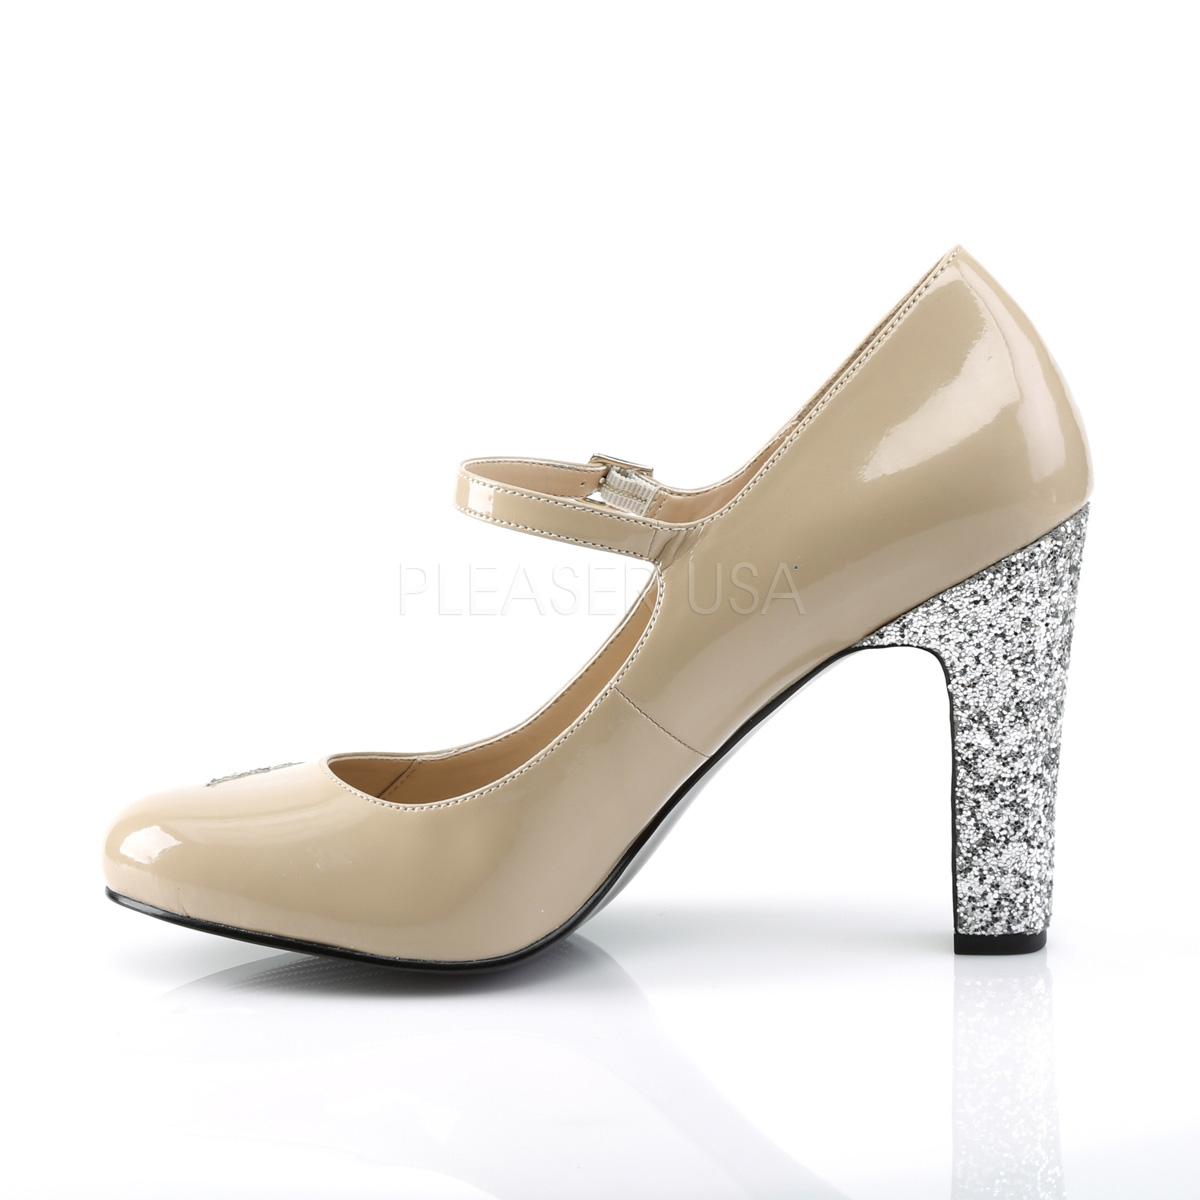 Pleaser Pink Label QUEEN-02 4inch Heel, Round Toe Mary Jane Pump◆取り寄せ